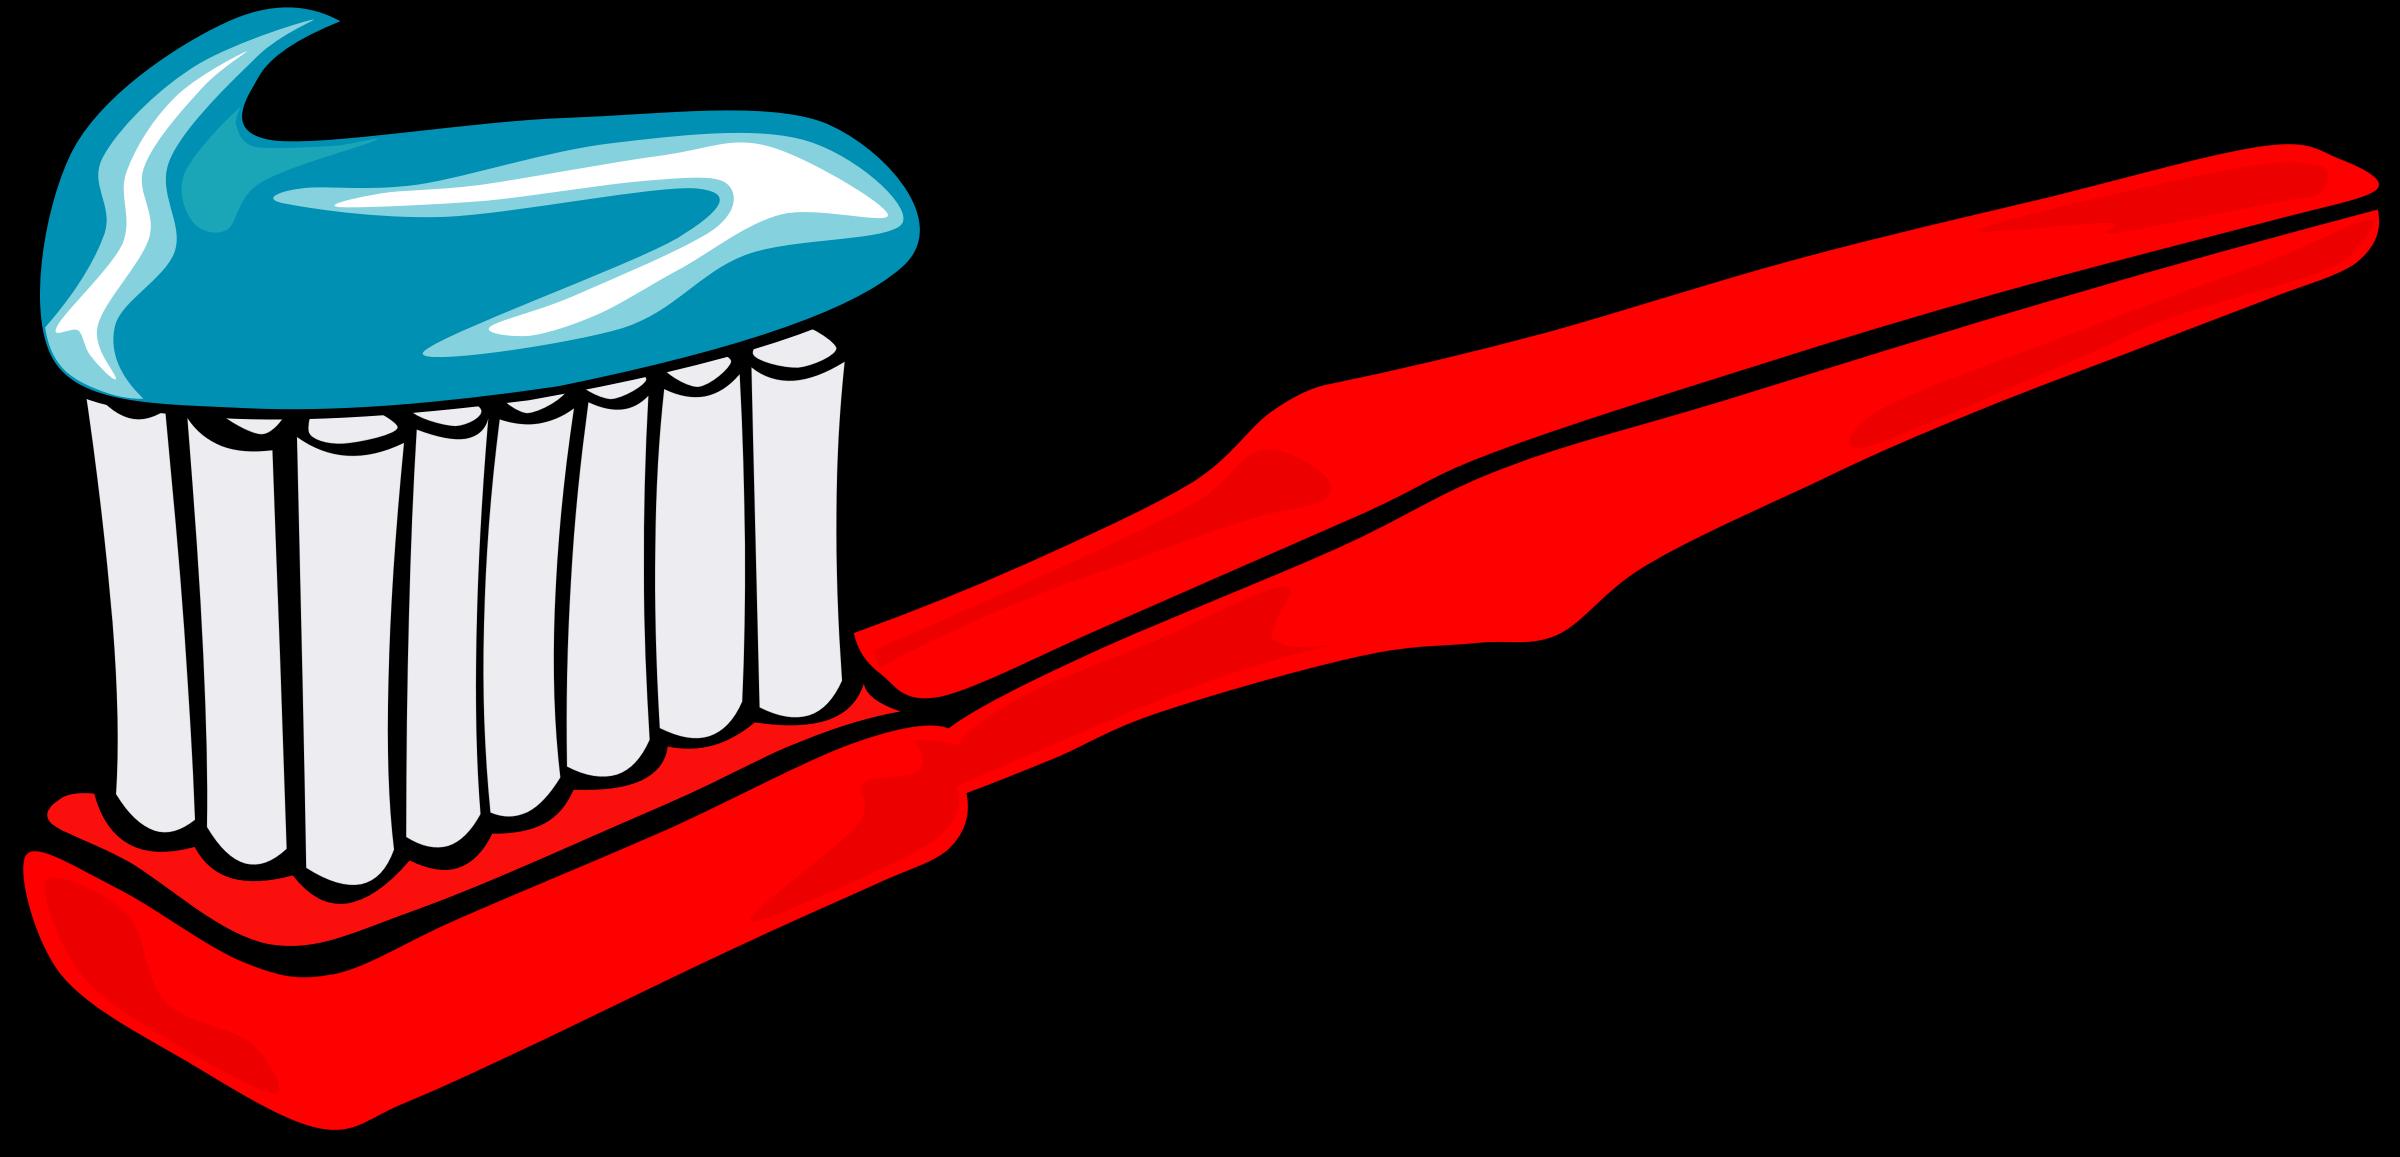 Toothbrush clipart big #1